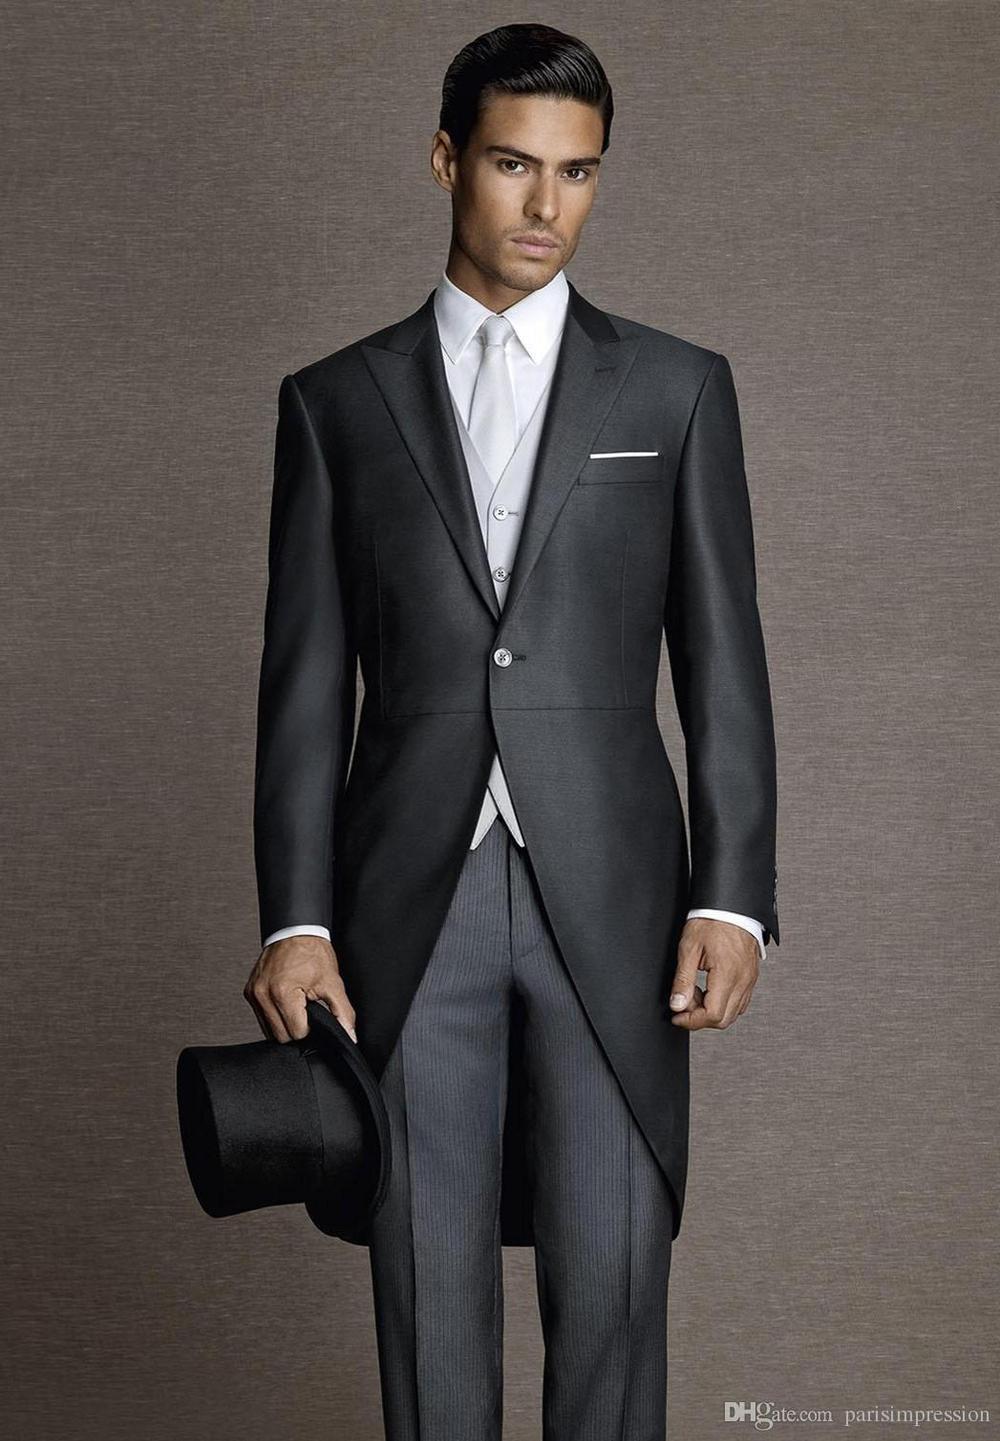 New arrival vintage black men tailcoats peaked lapel wedding suits for